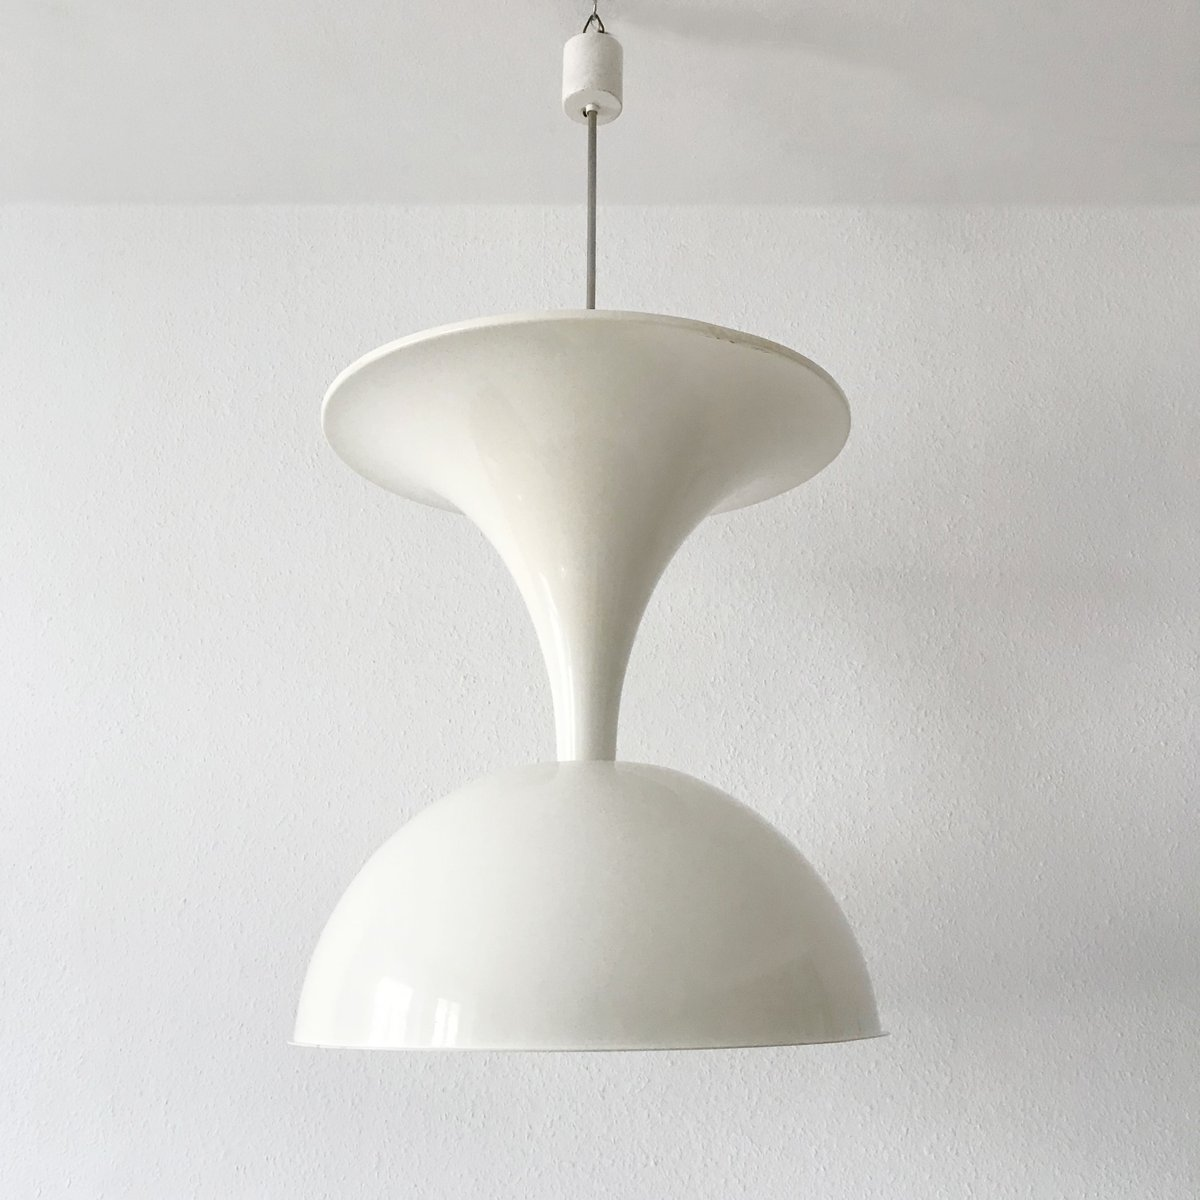 mid century pendant lighting. Mid-Century Large Italian Pendant Lamp By Ecolight, 1960s Mid Century Lighting D